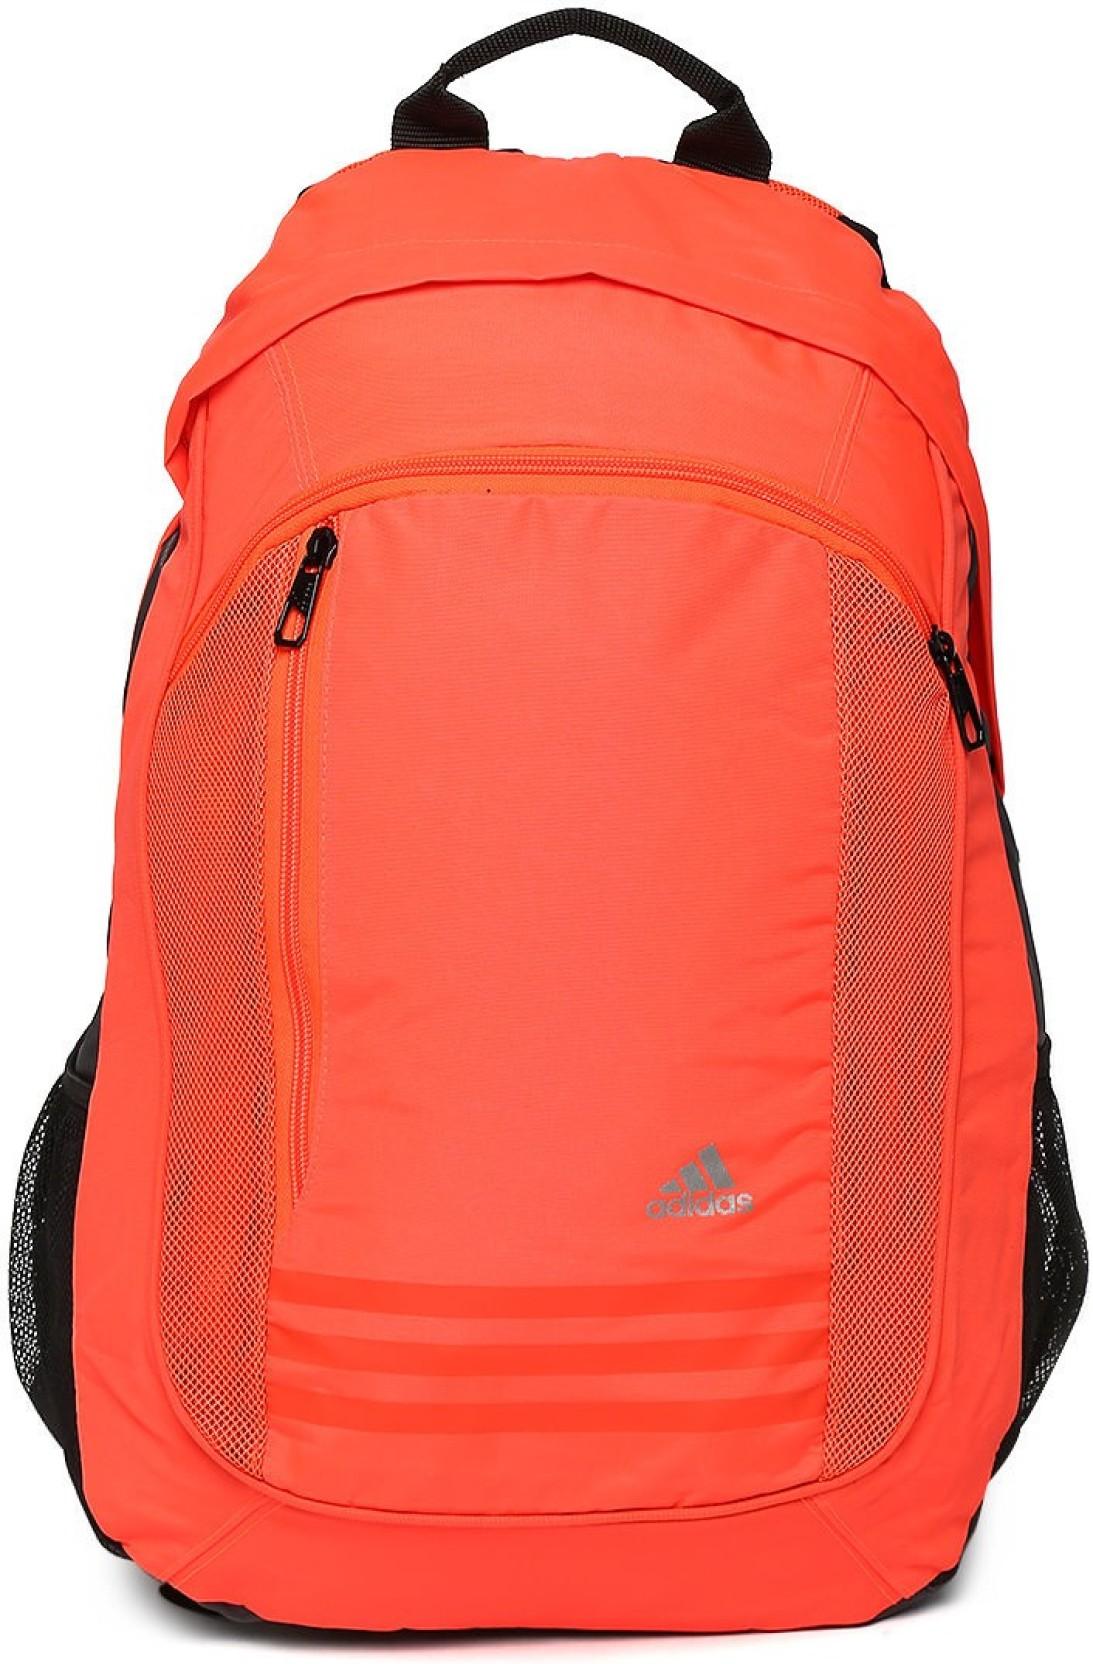 ADIDAS Clima Bp Backpack Backpack. Share 1823efaaca18a